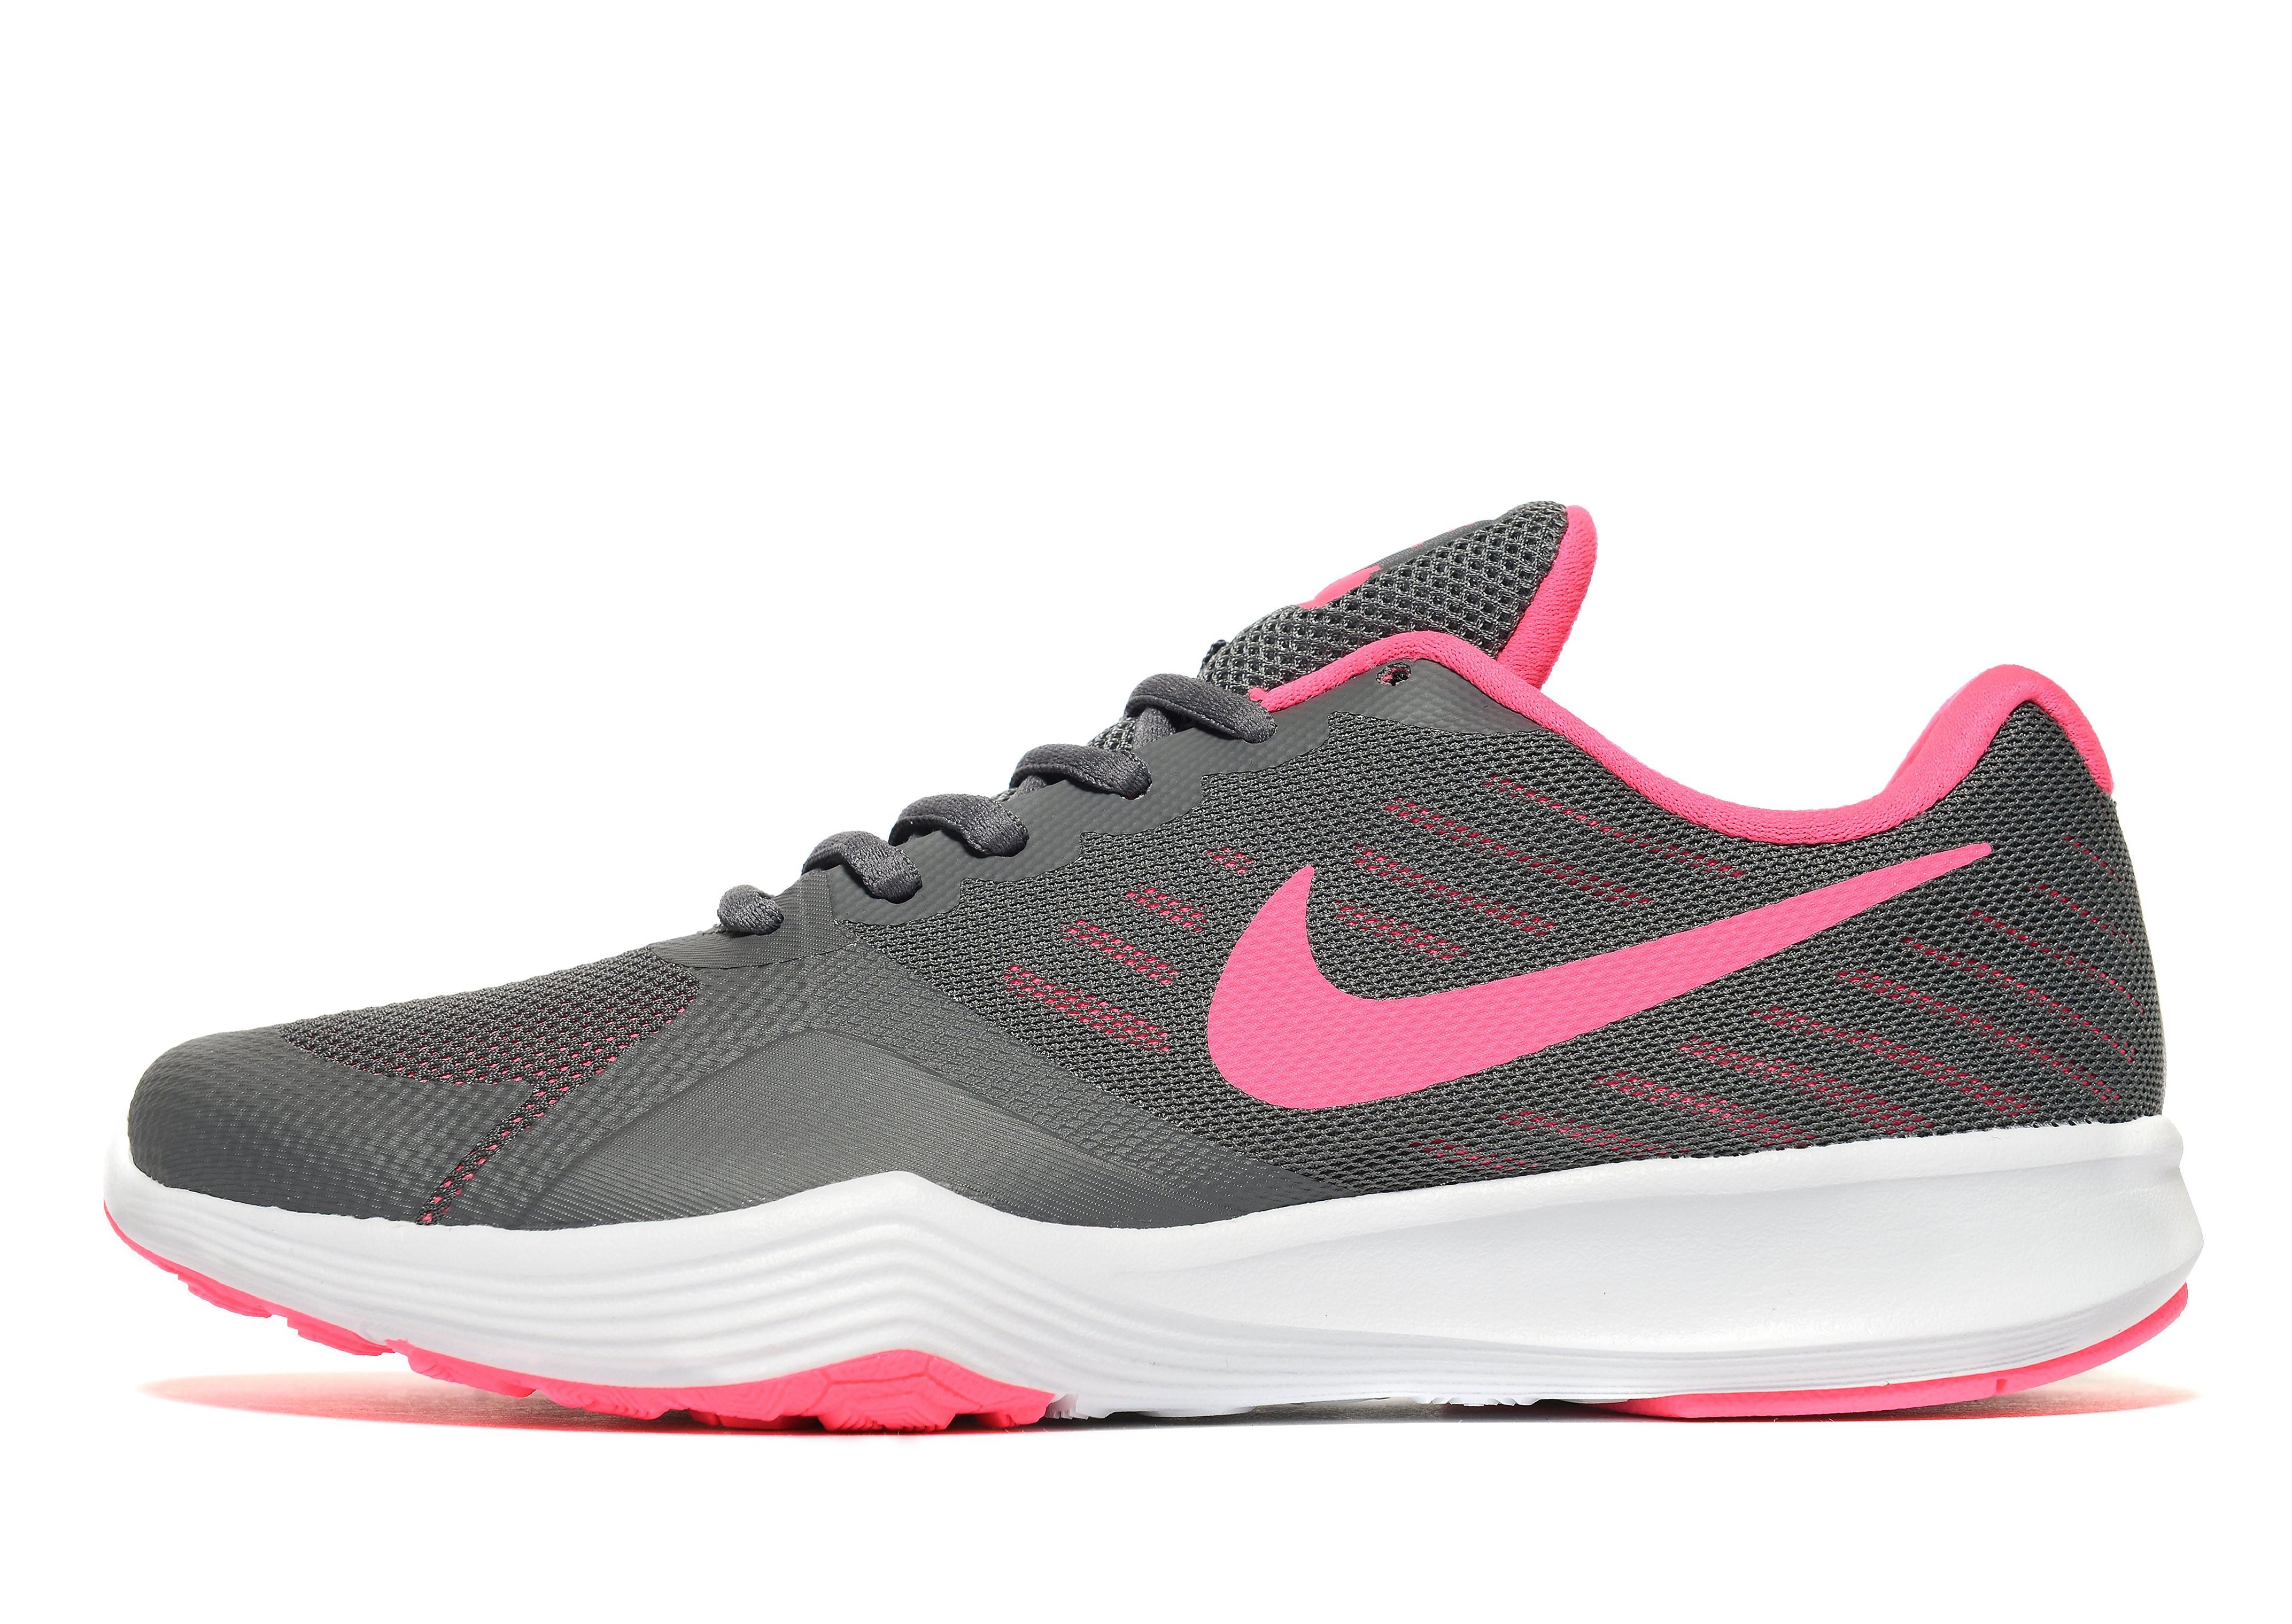 Nike Women's City Trainers